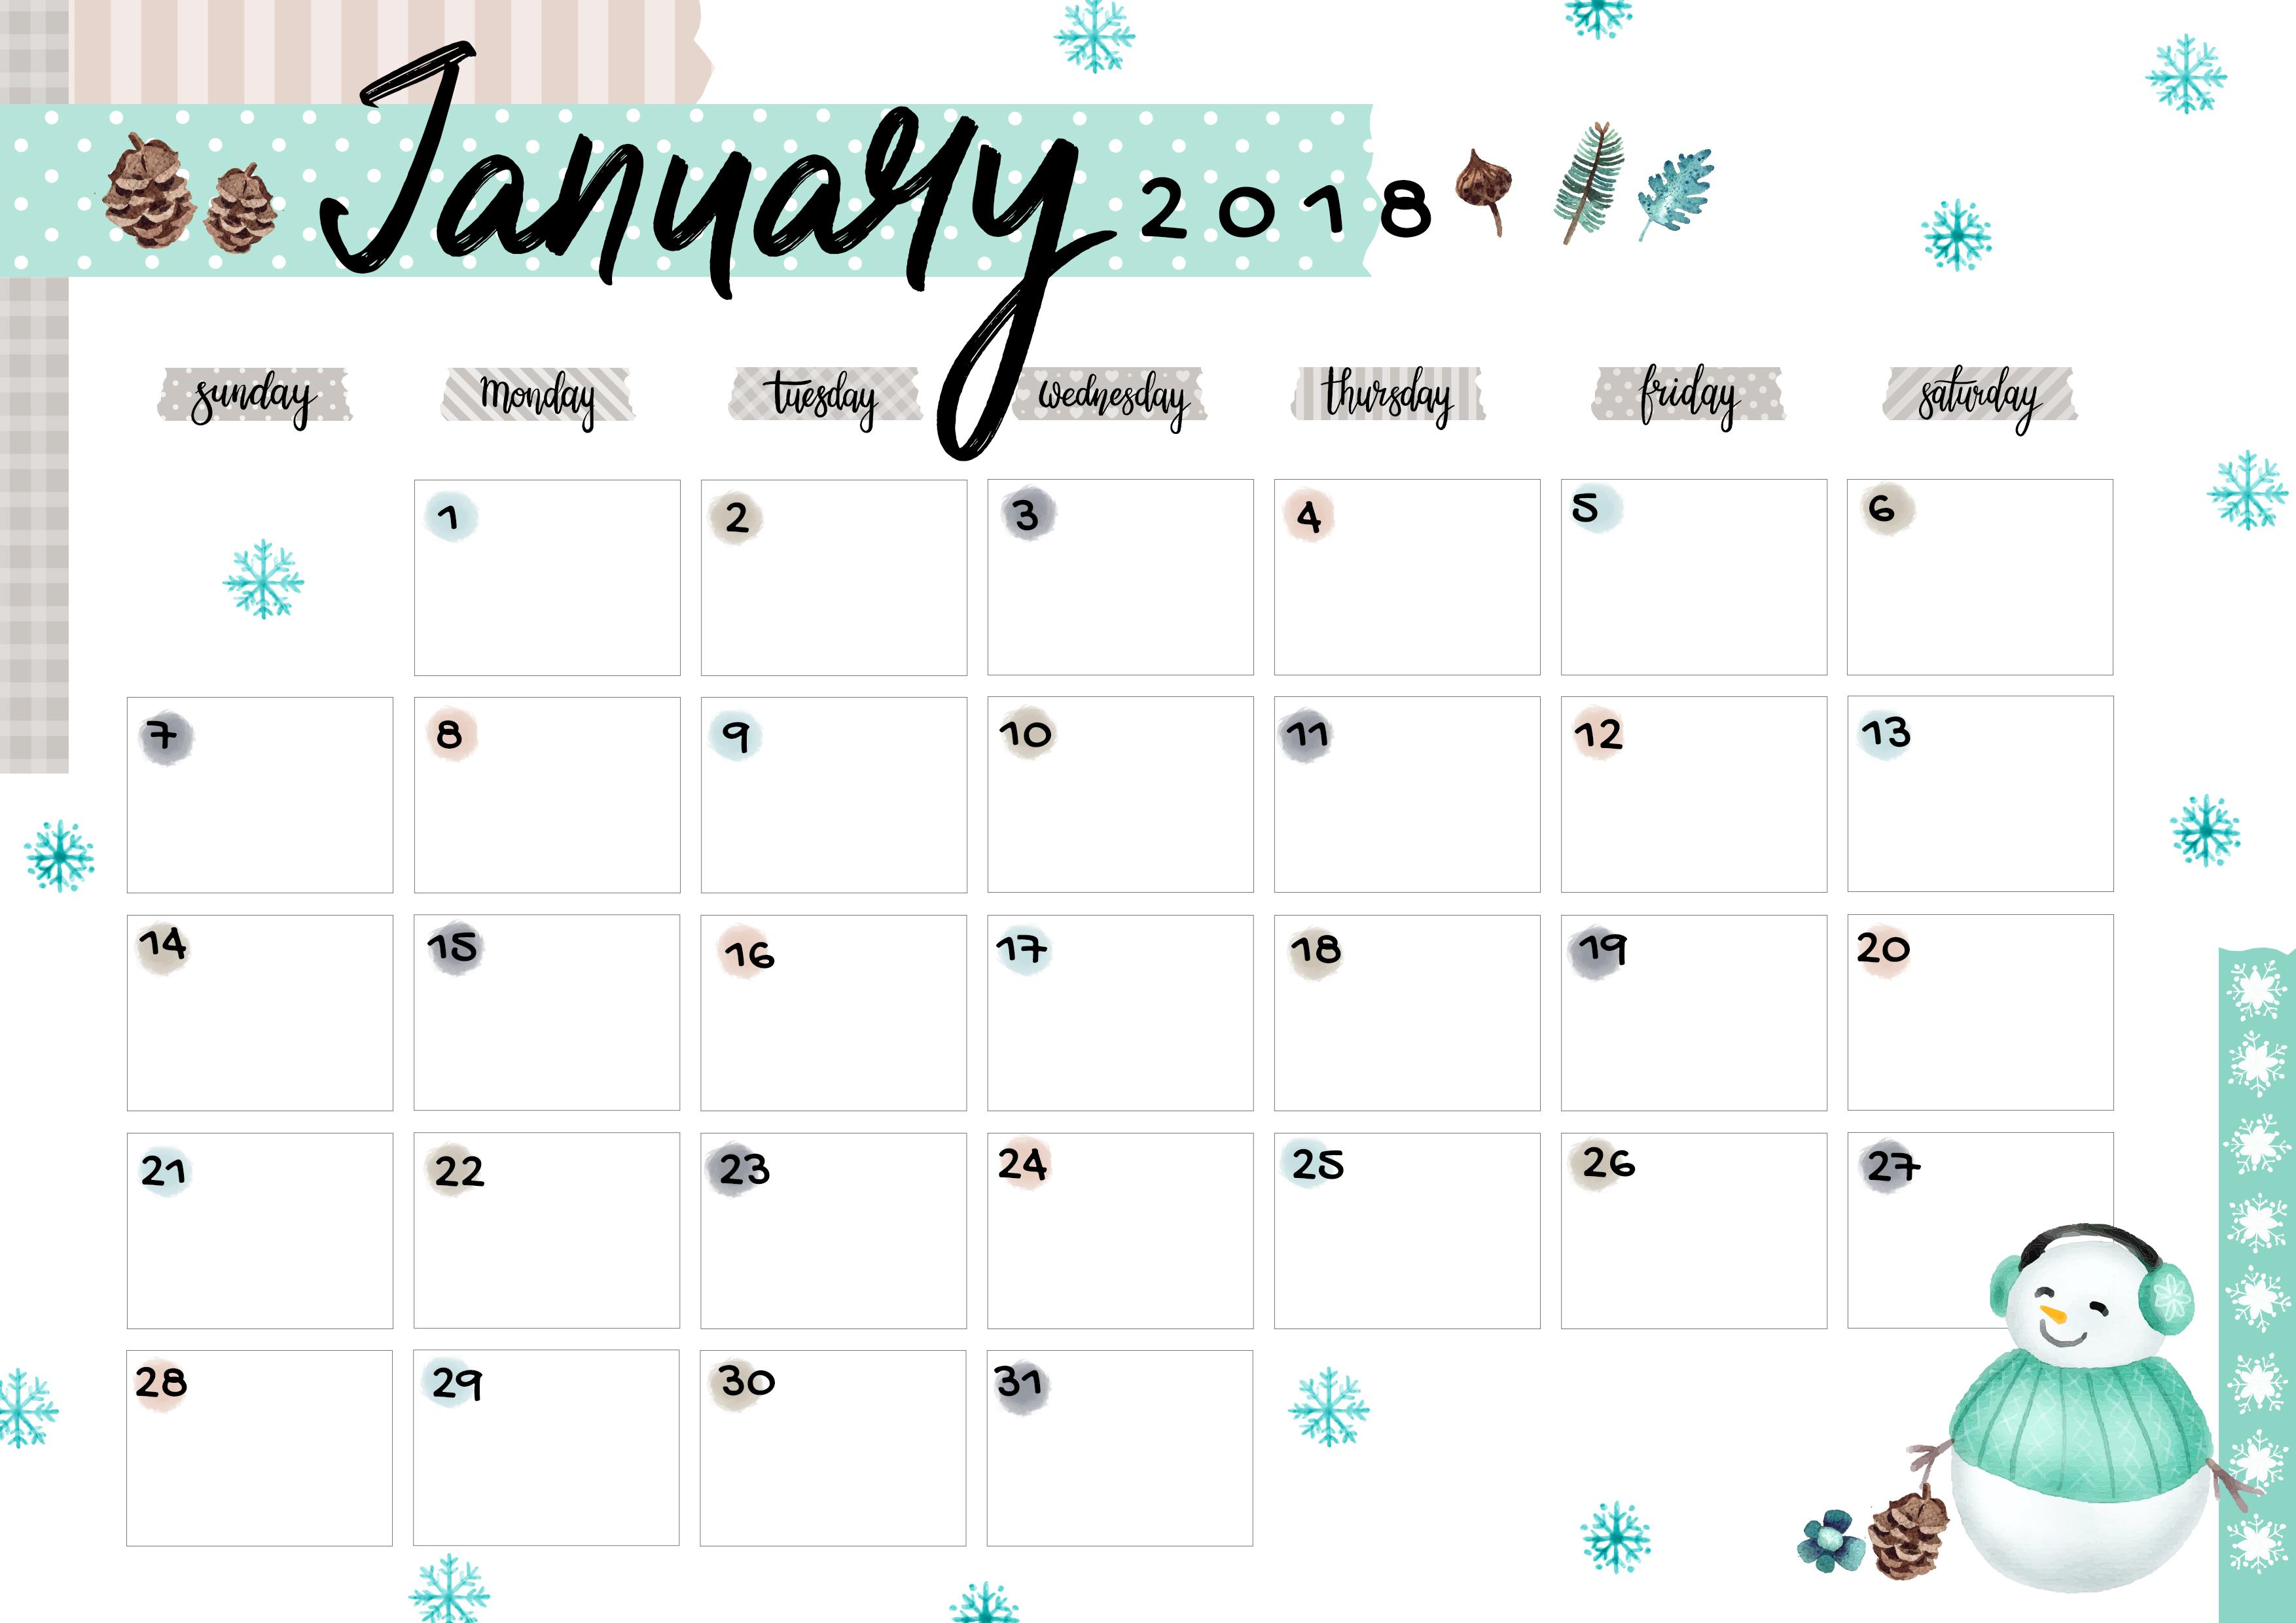 January Printable Colorful Calendar Free Download